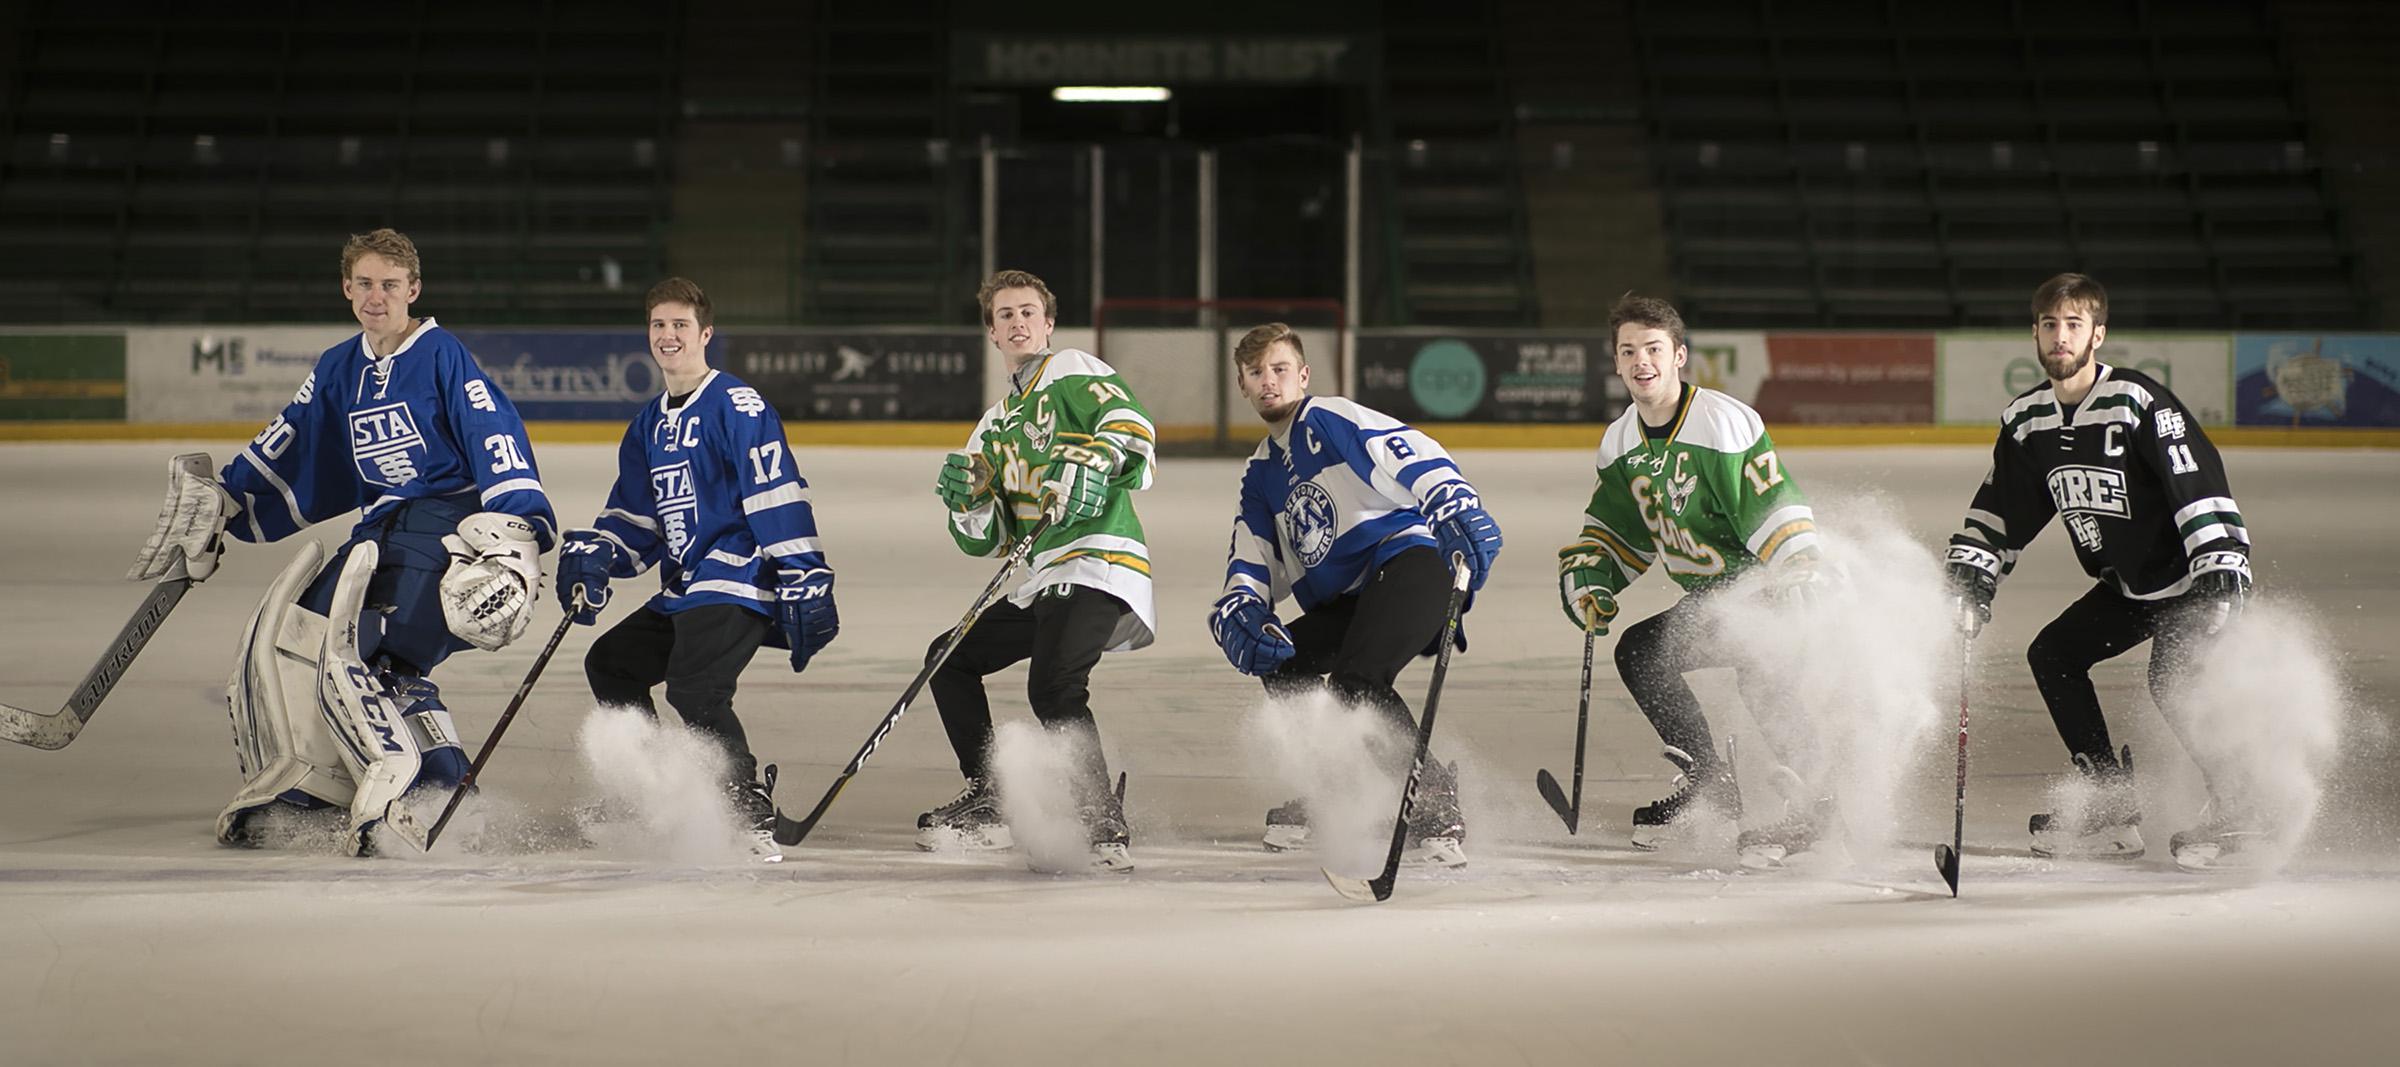 MN H.S.: Meet The 2018 Star Tribune Boys' Hockey All-Metro First Team